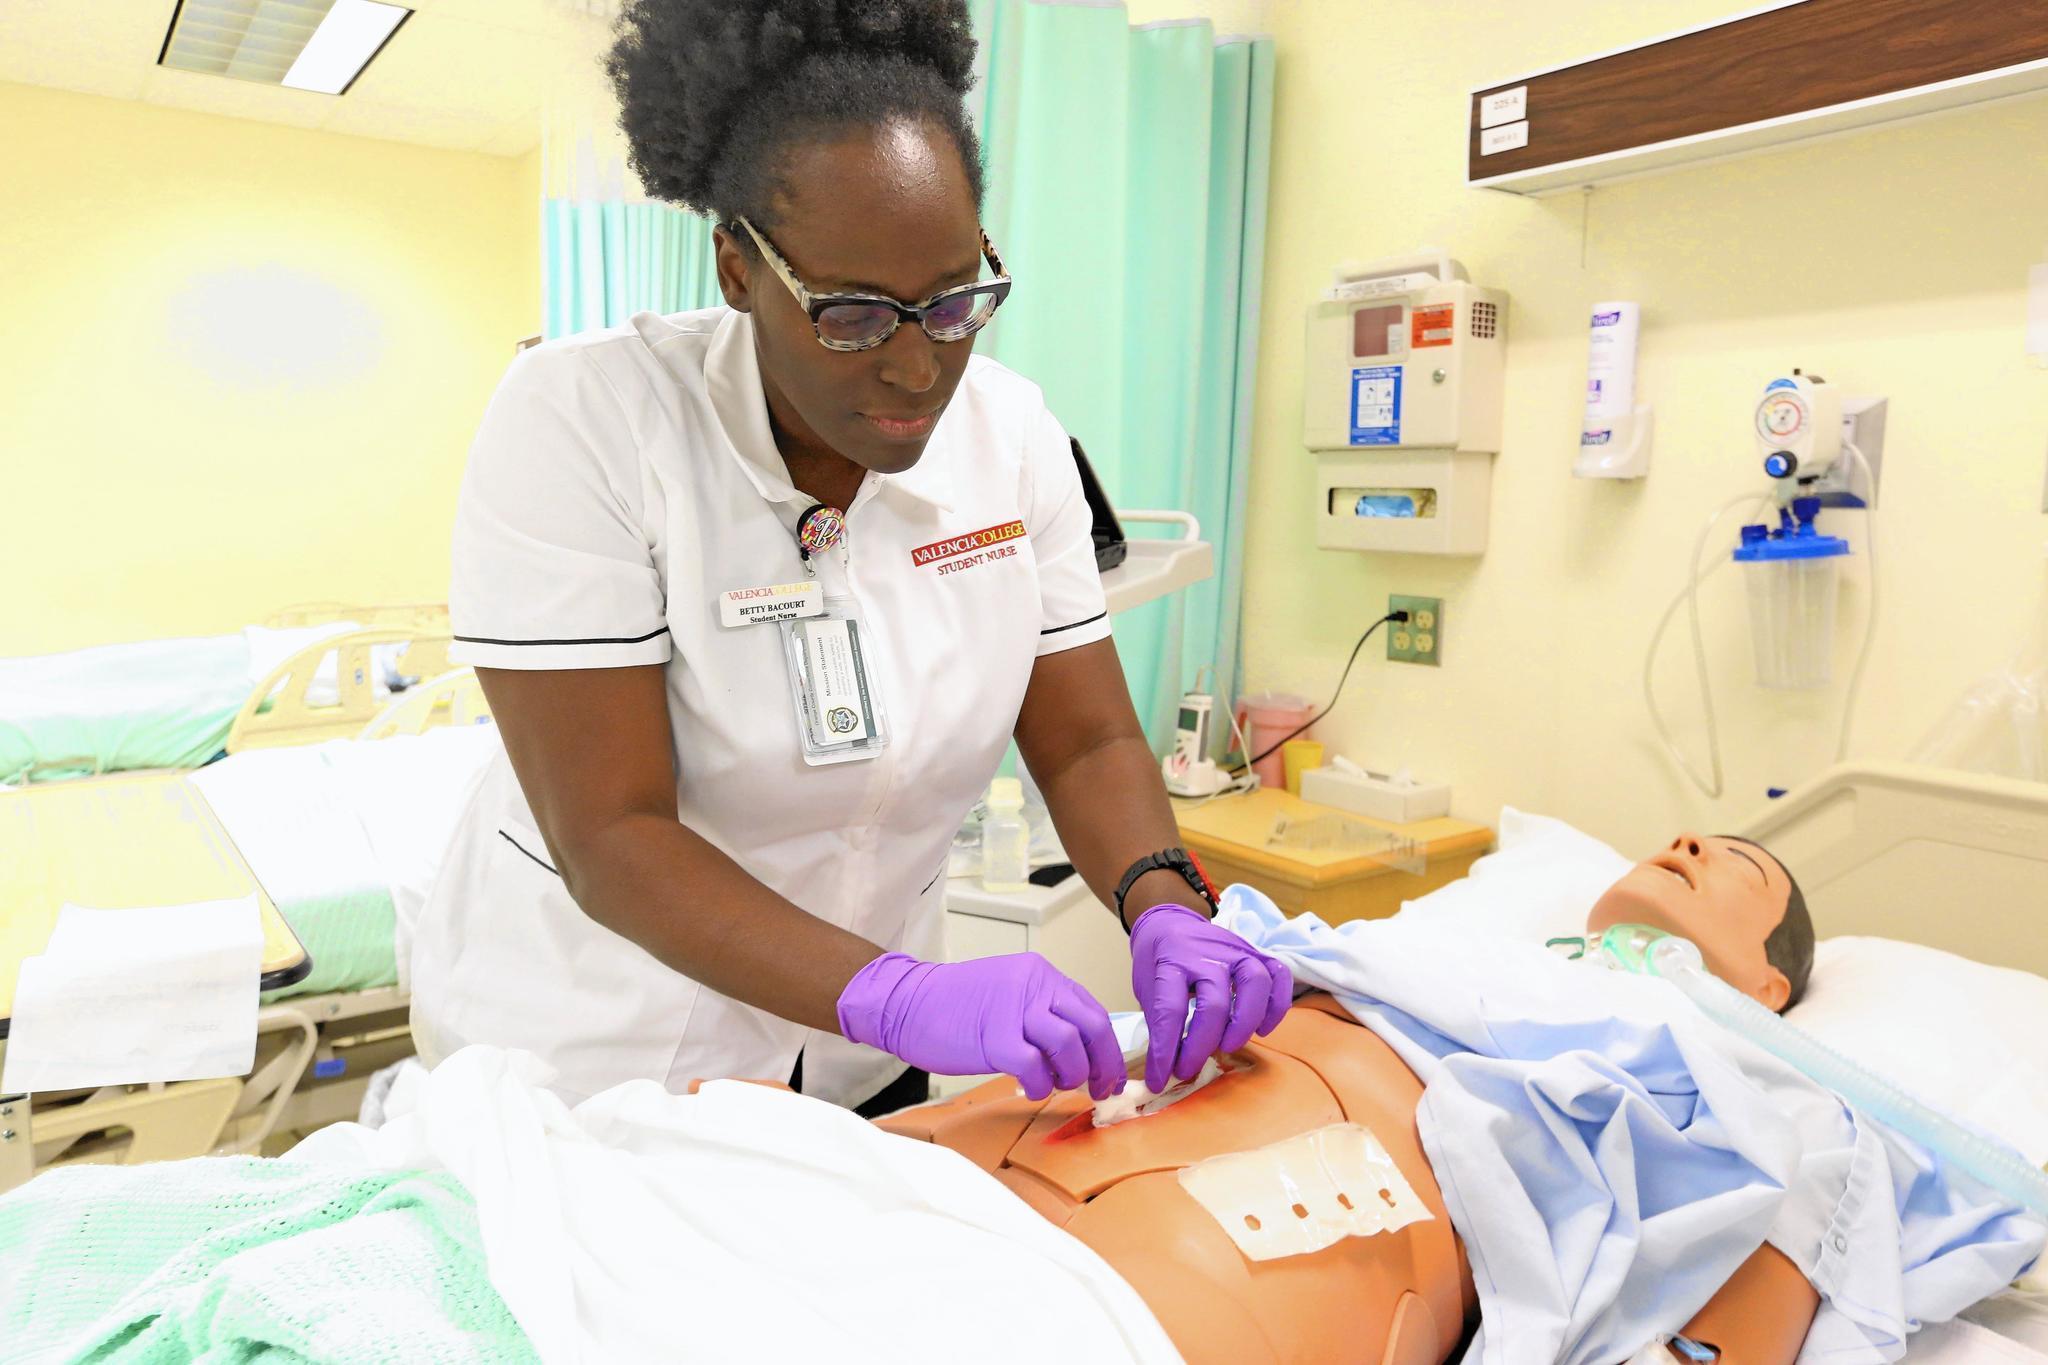 Ucf College Of Nursing >> Schools scramble to fight state's nurse shortage - Orlando ...